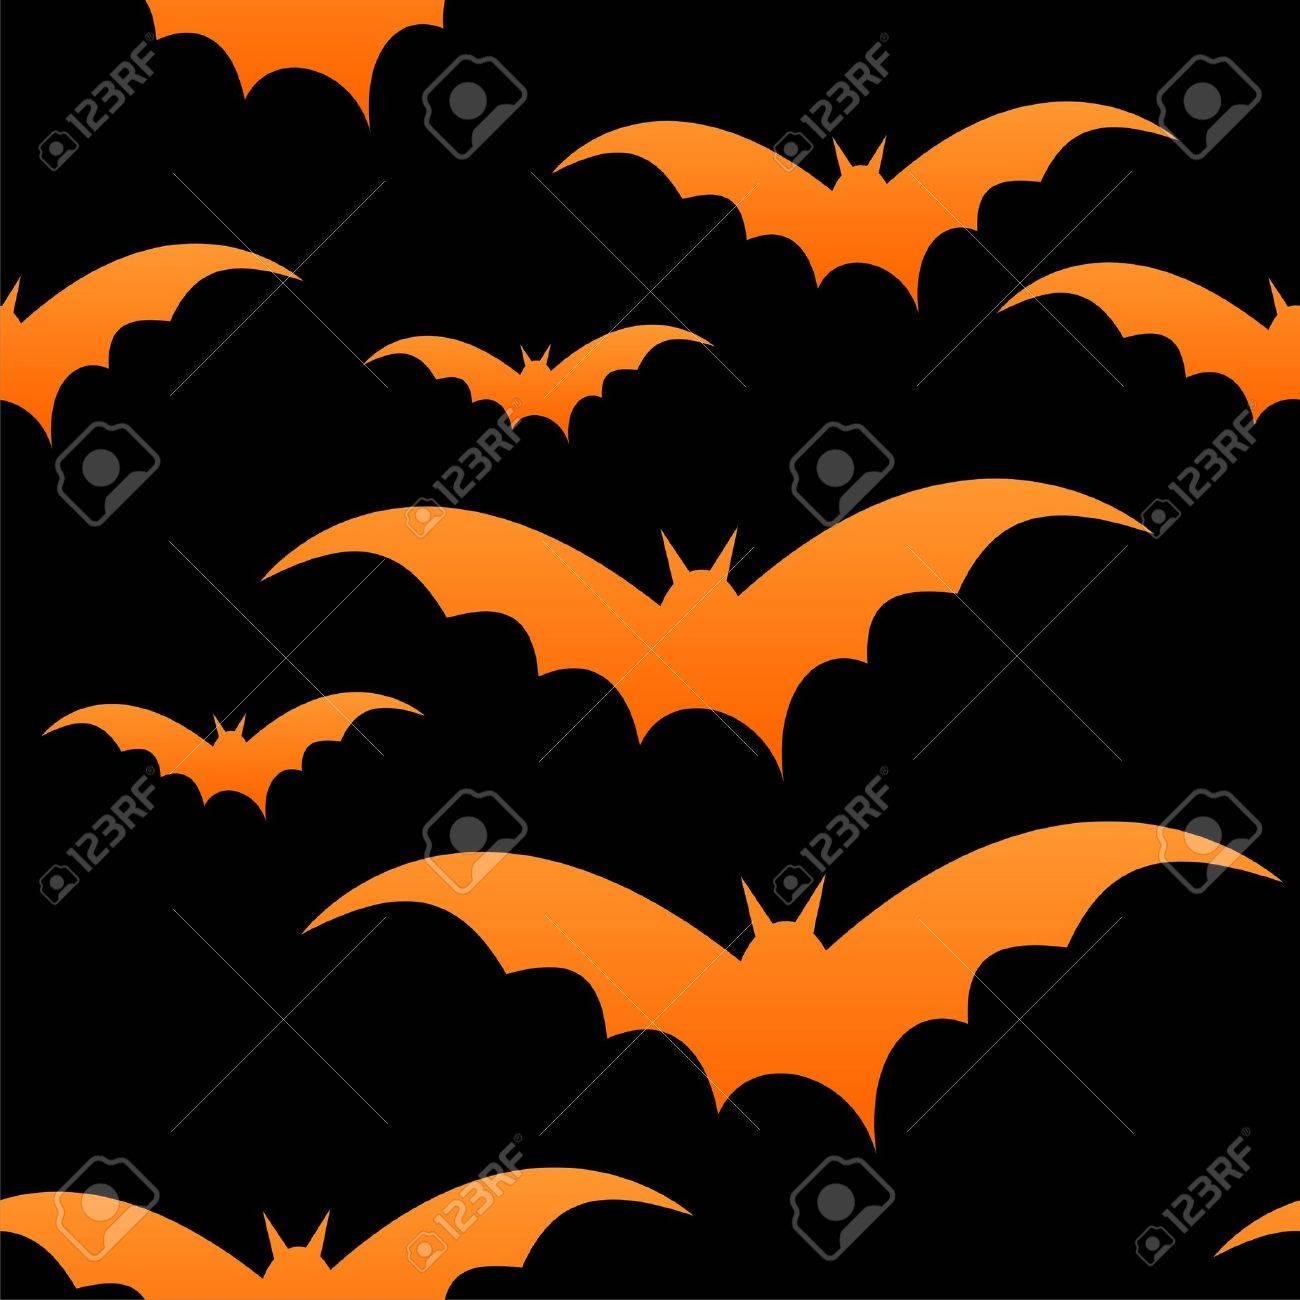 orange bats on black seamless tile halloween stock vector 10692307 - Black And Orange Halloween